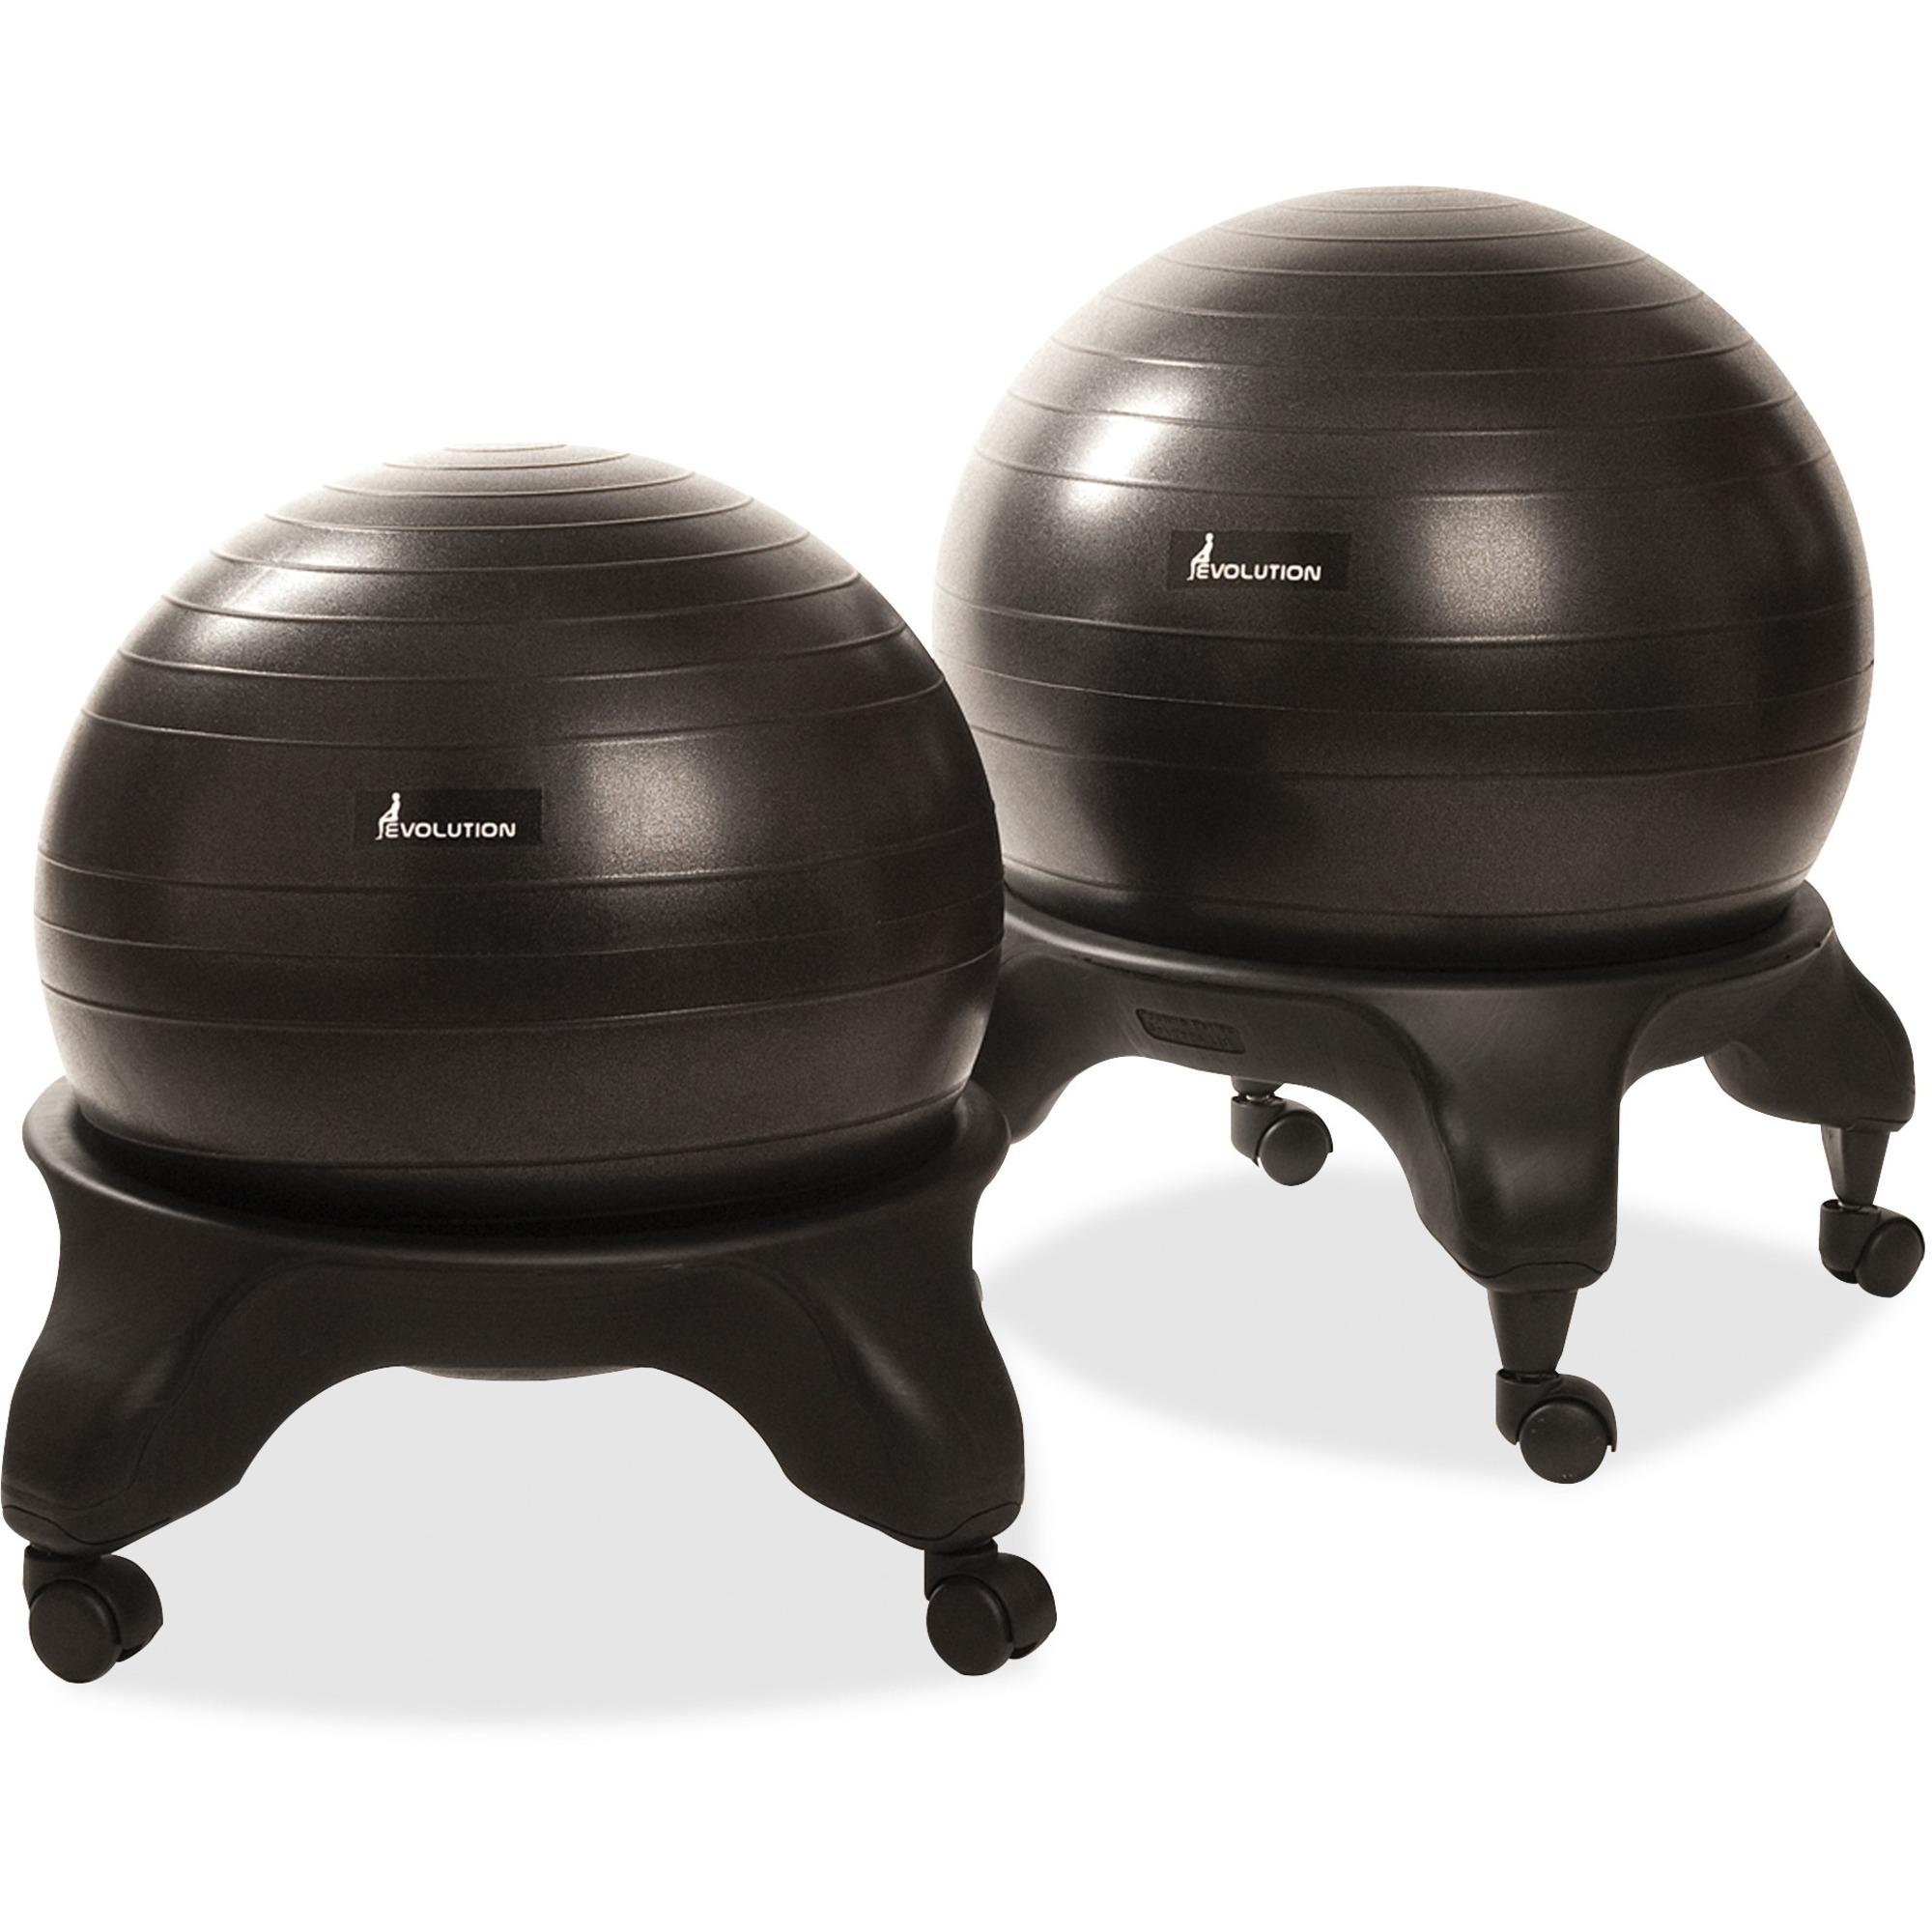 perfect posture chair wheelchair hot wheels solutions evolution ball black